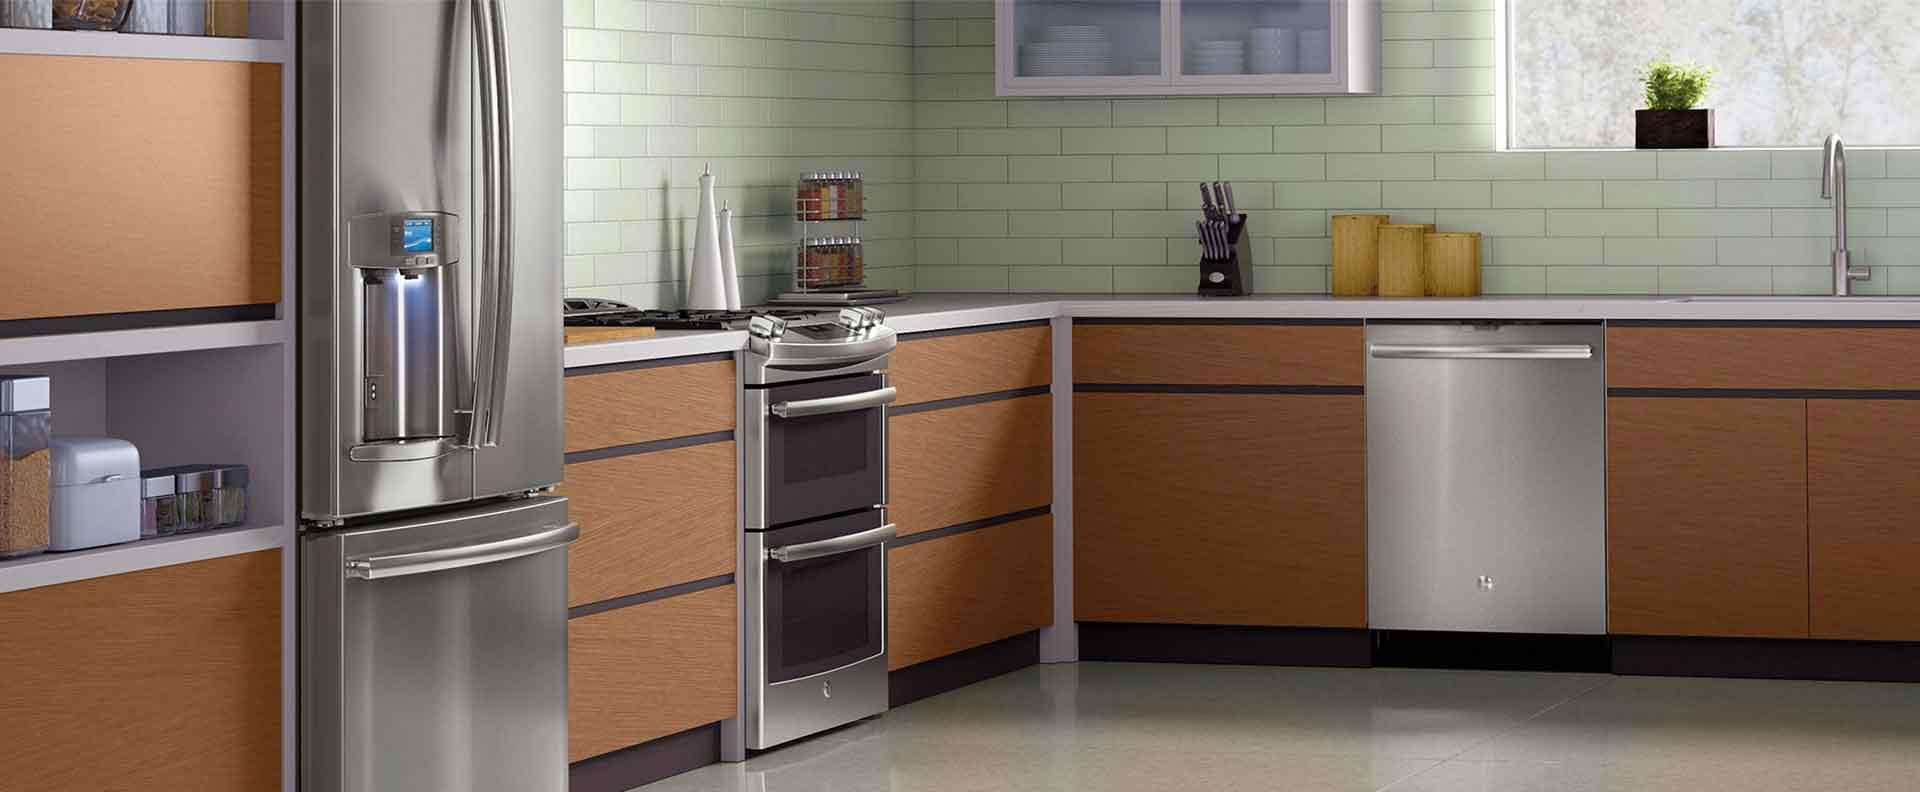 editorial staff autore a ha household appliances parts